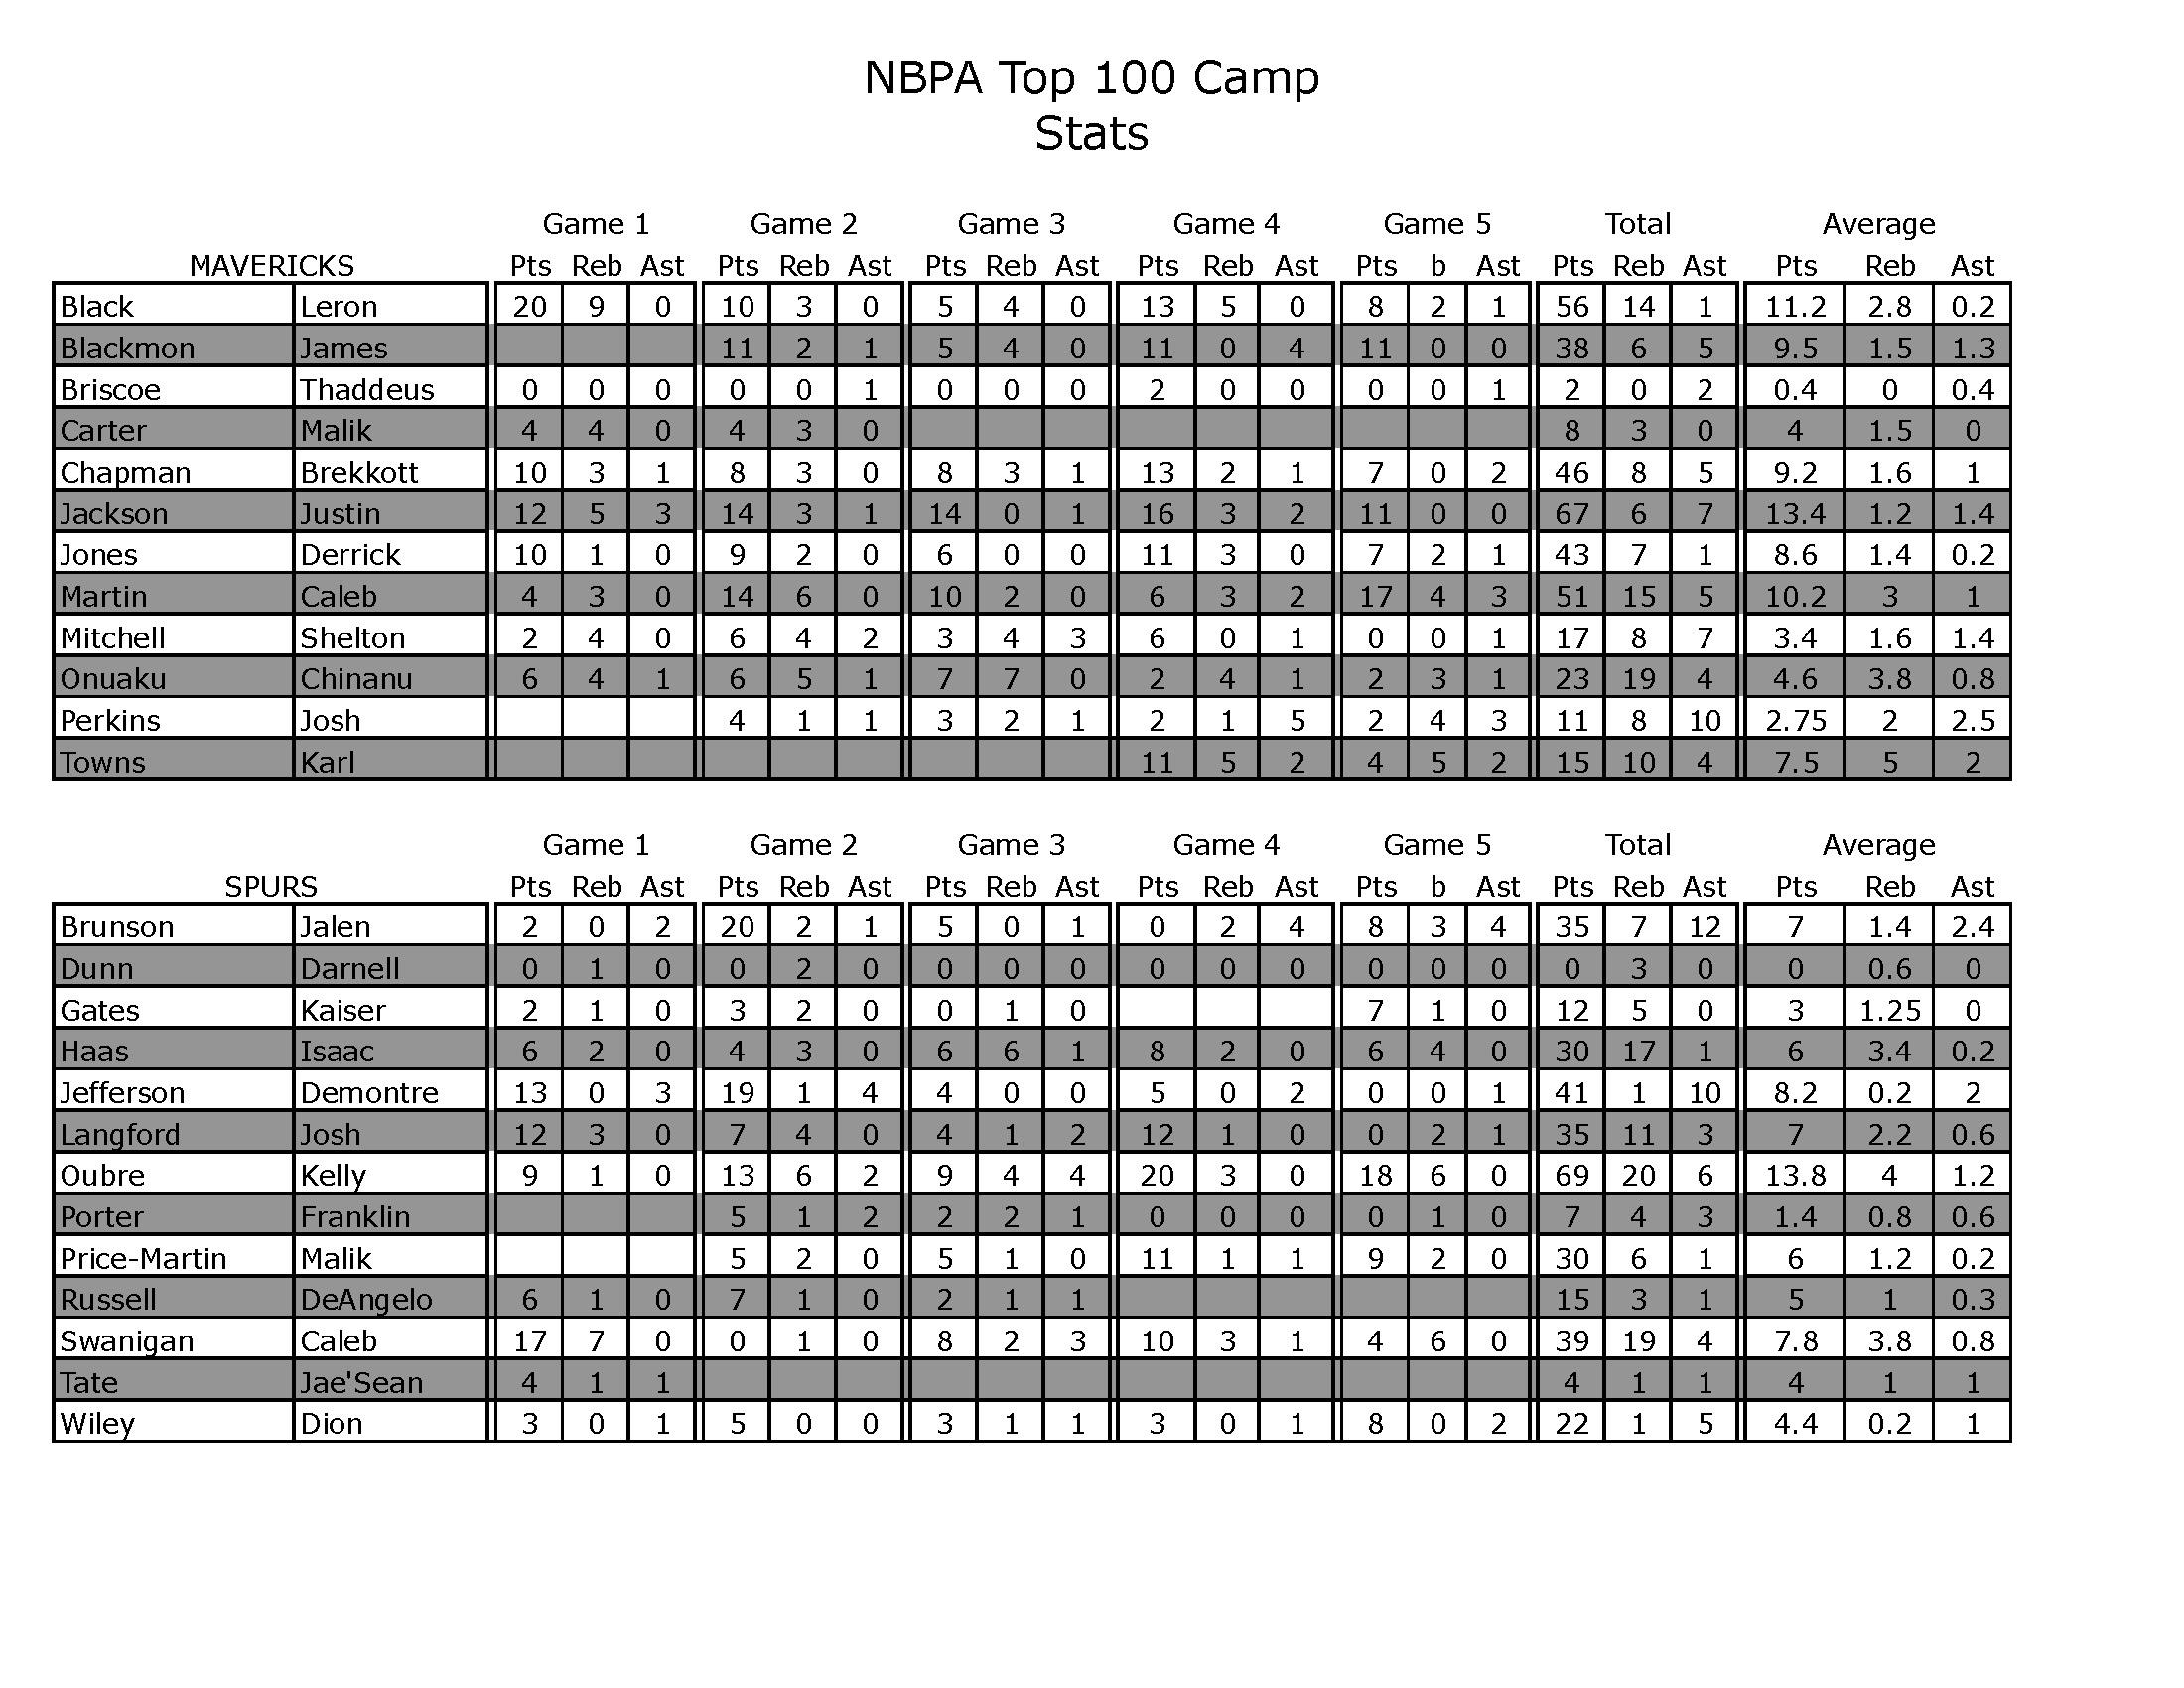 NBPA STATS FINAL_Page_4